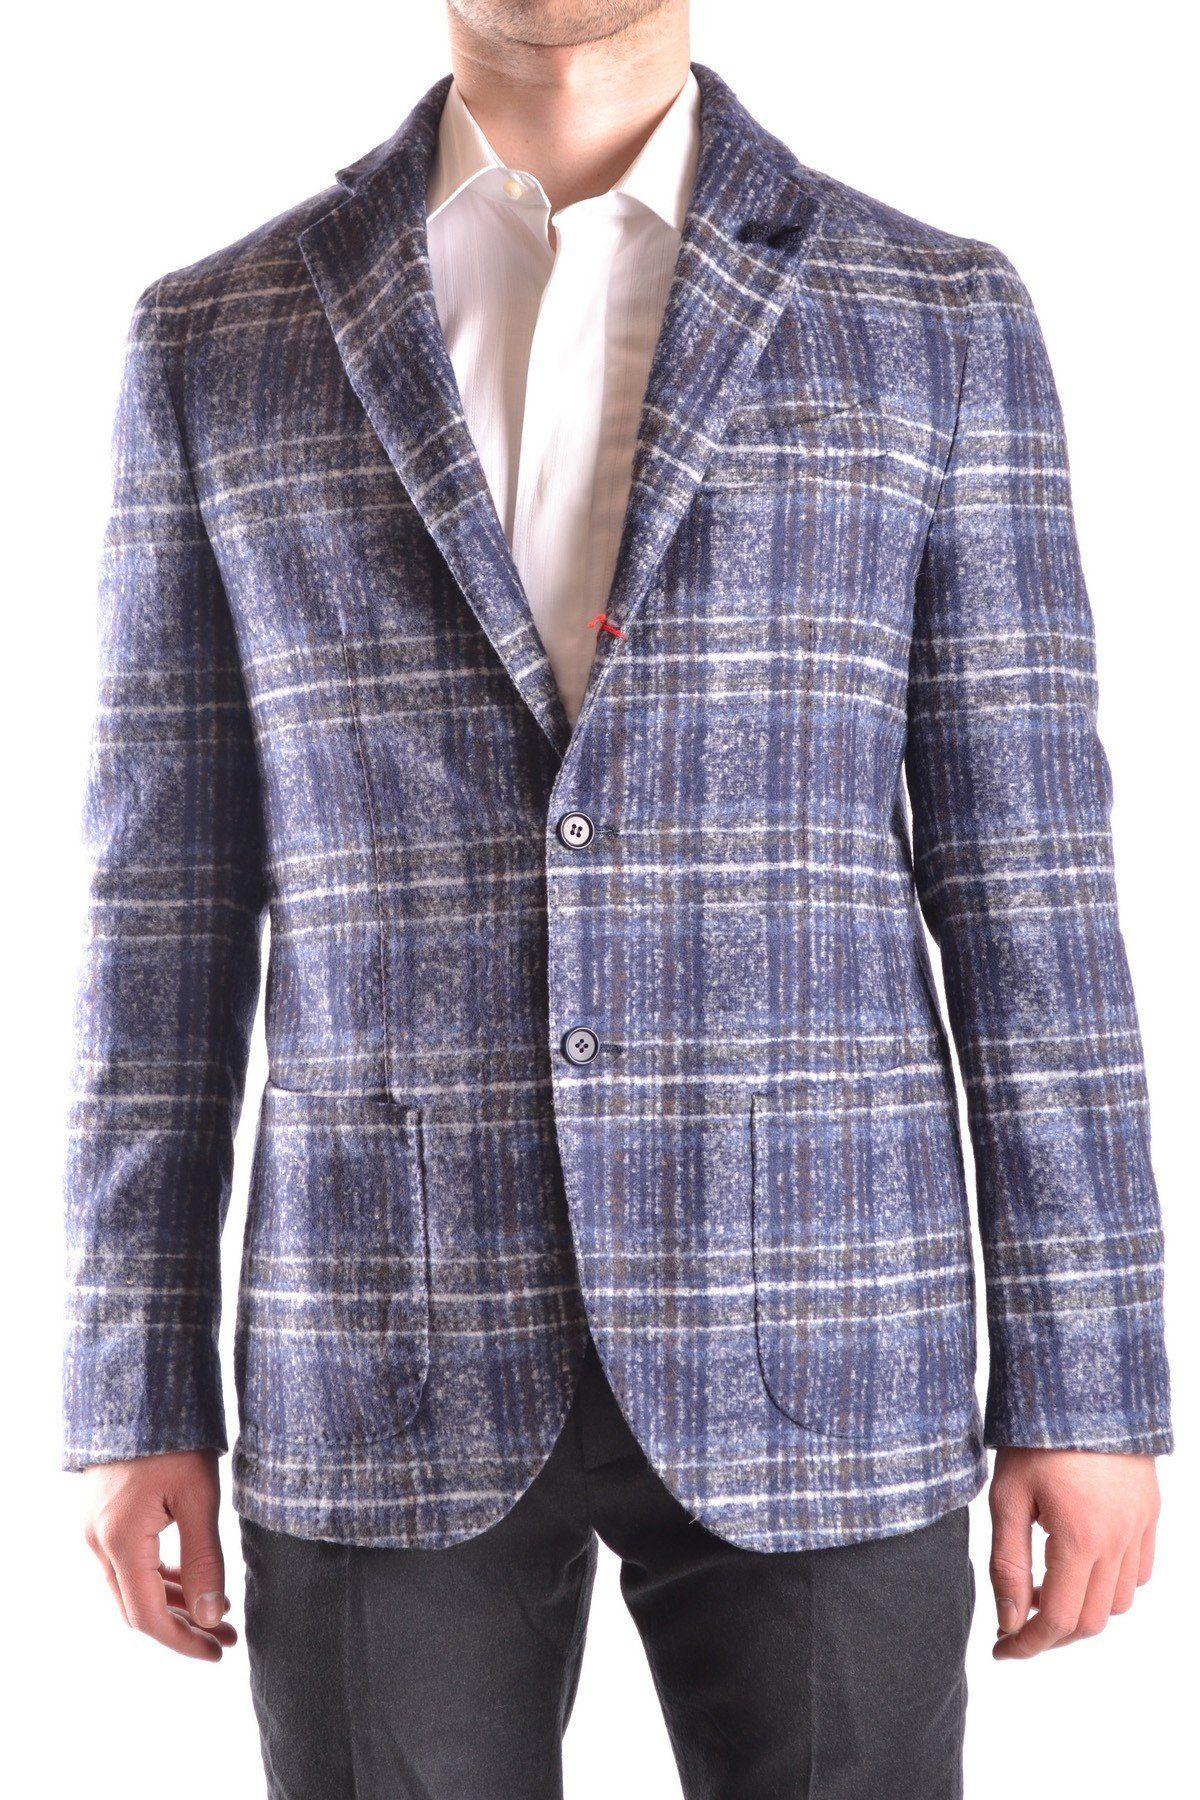 Altea Men's Blazer In Blue